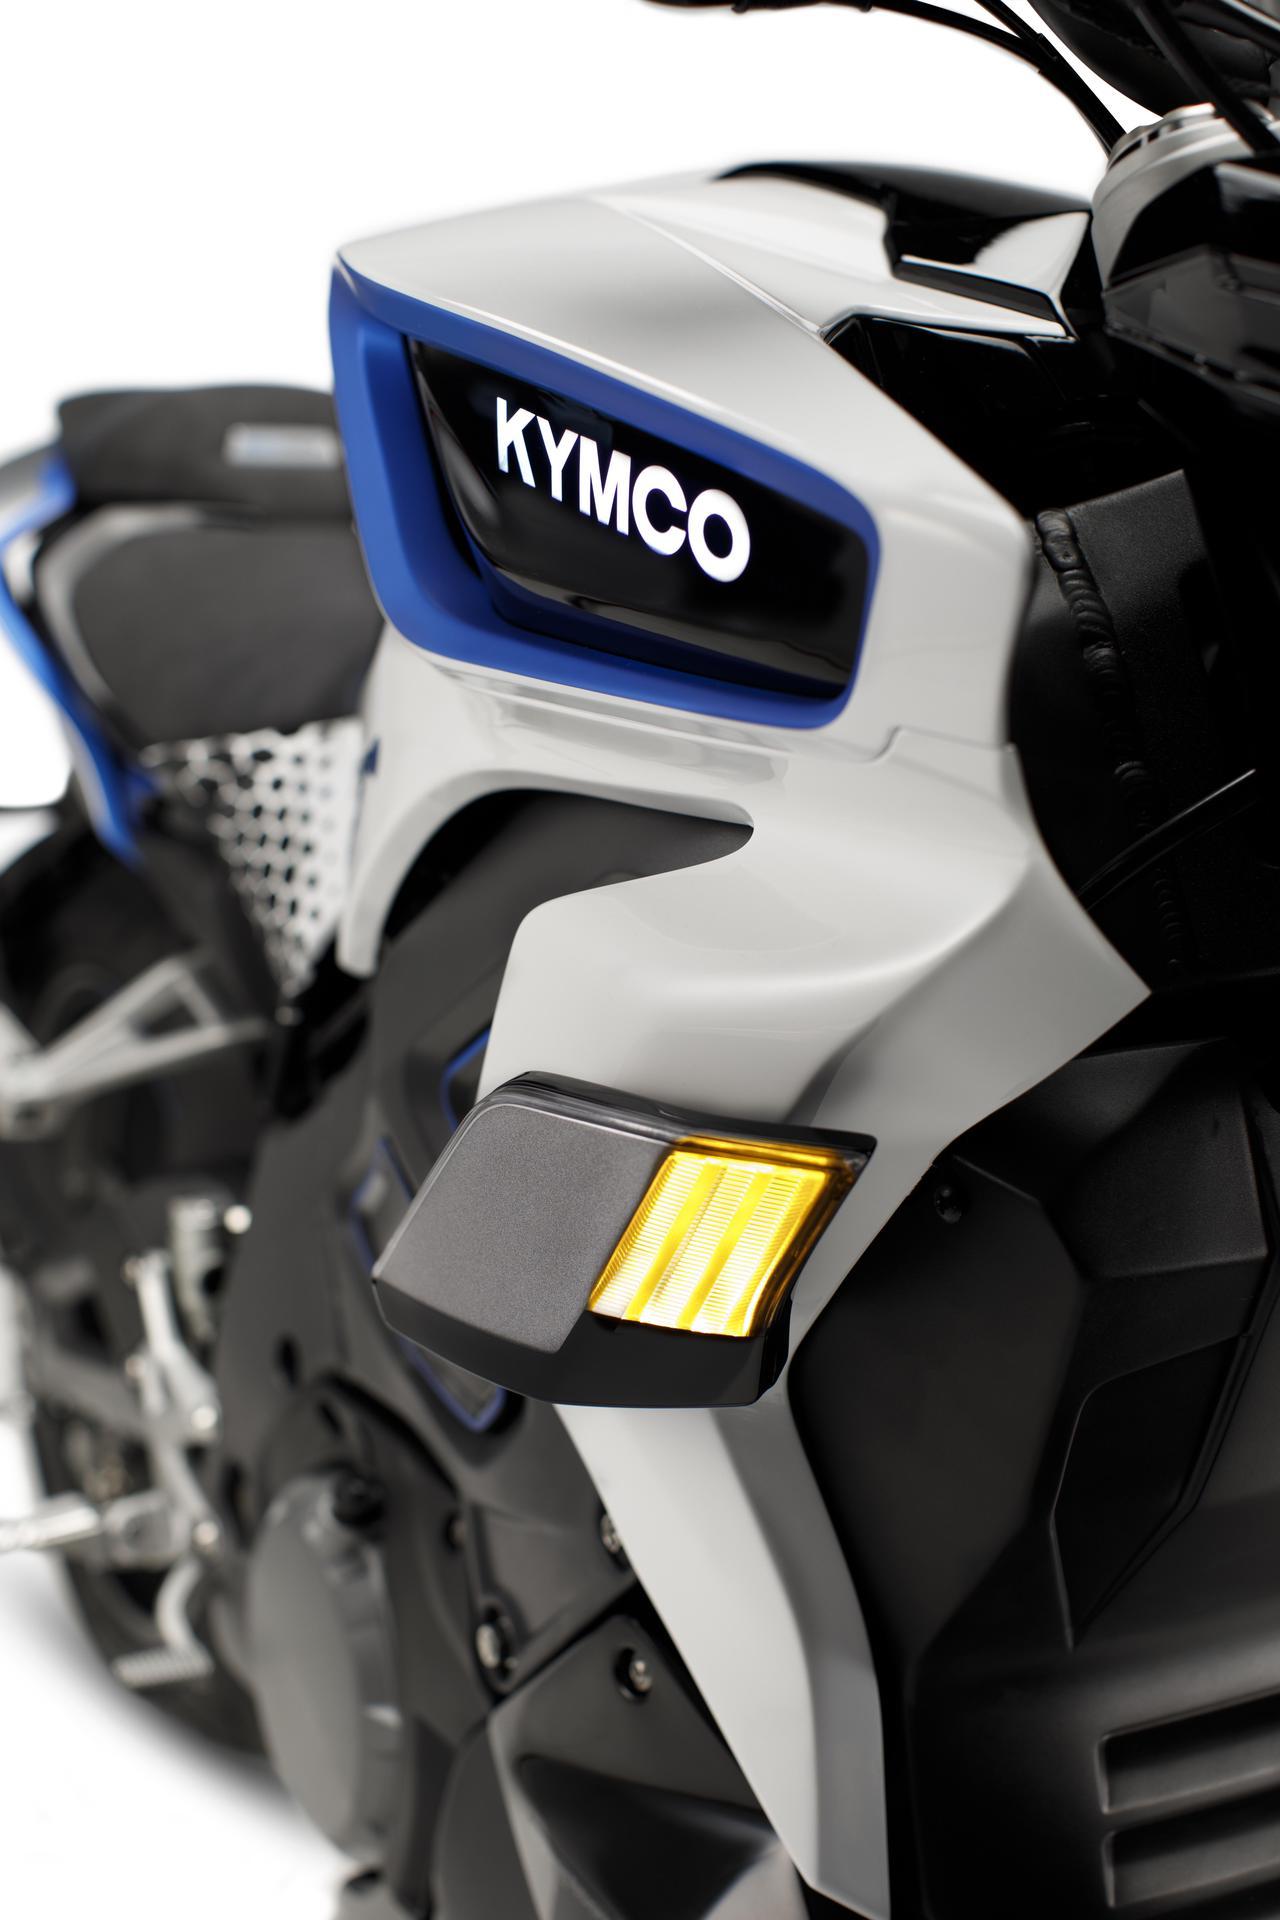 Images : 17番目の画像 - キムコ「RevoNEX」の写真を見る! - webオートバイ